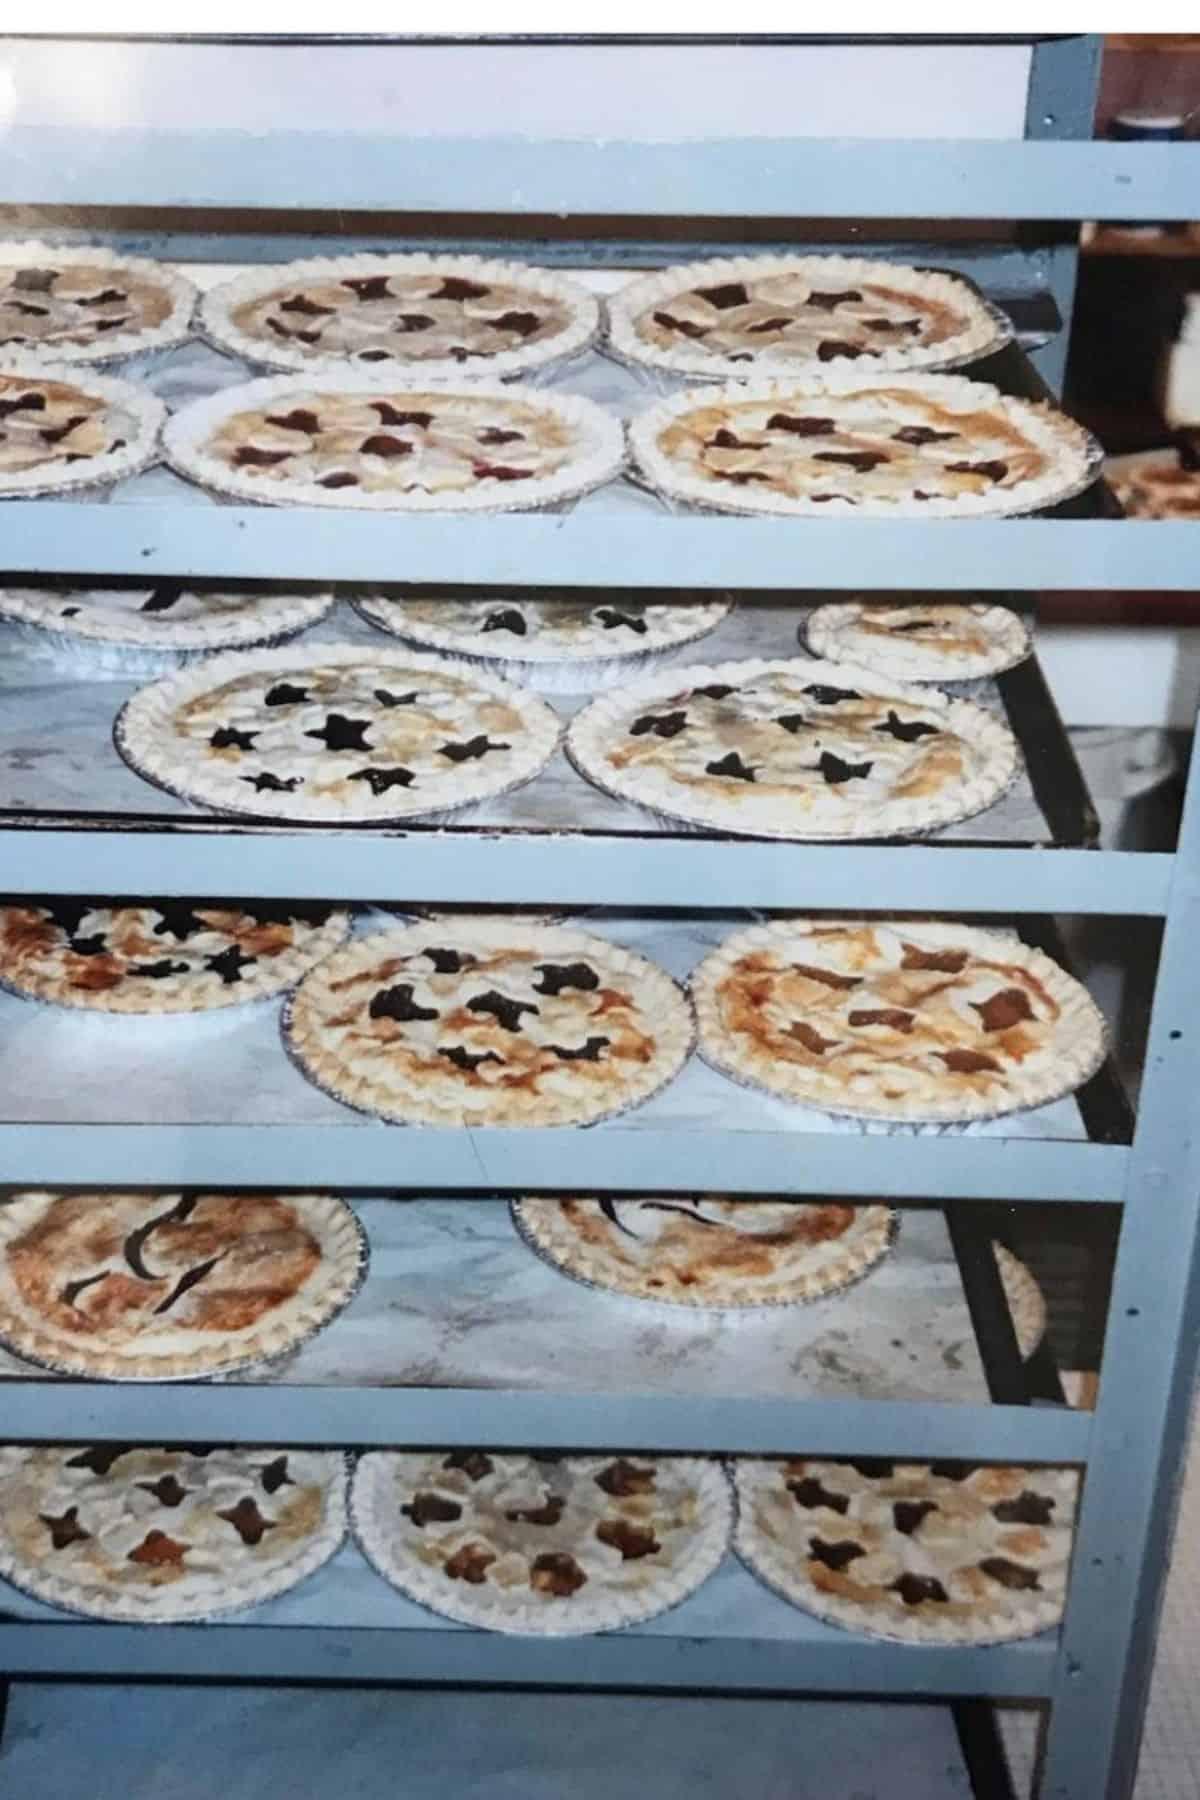 many apple pies on racks in bakery